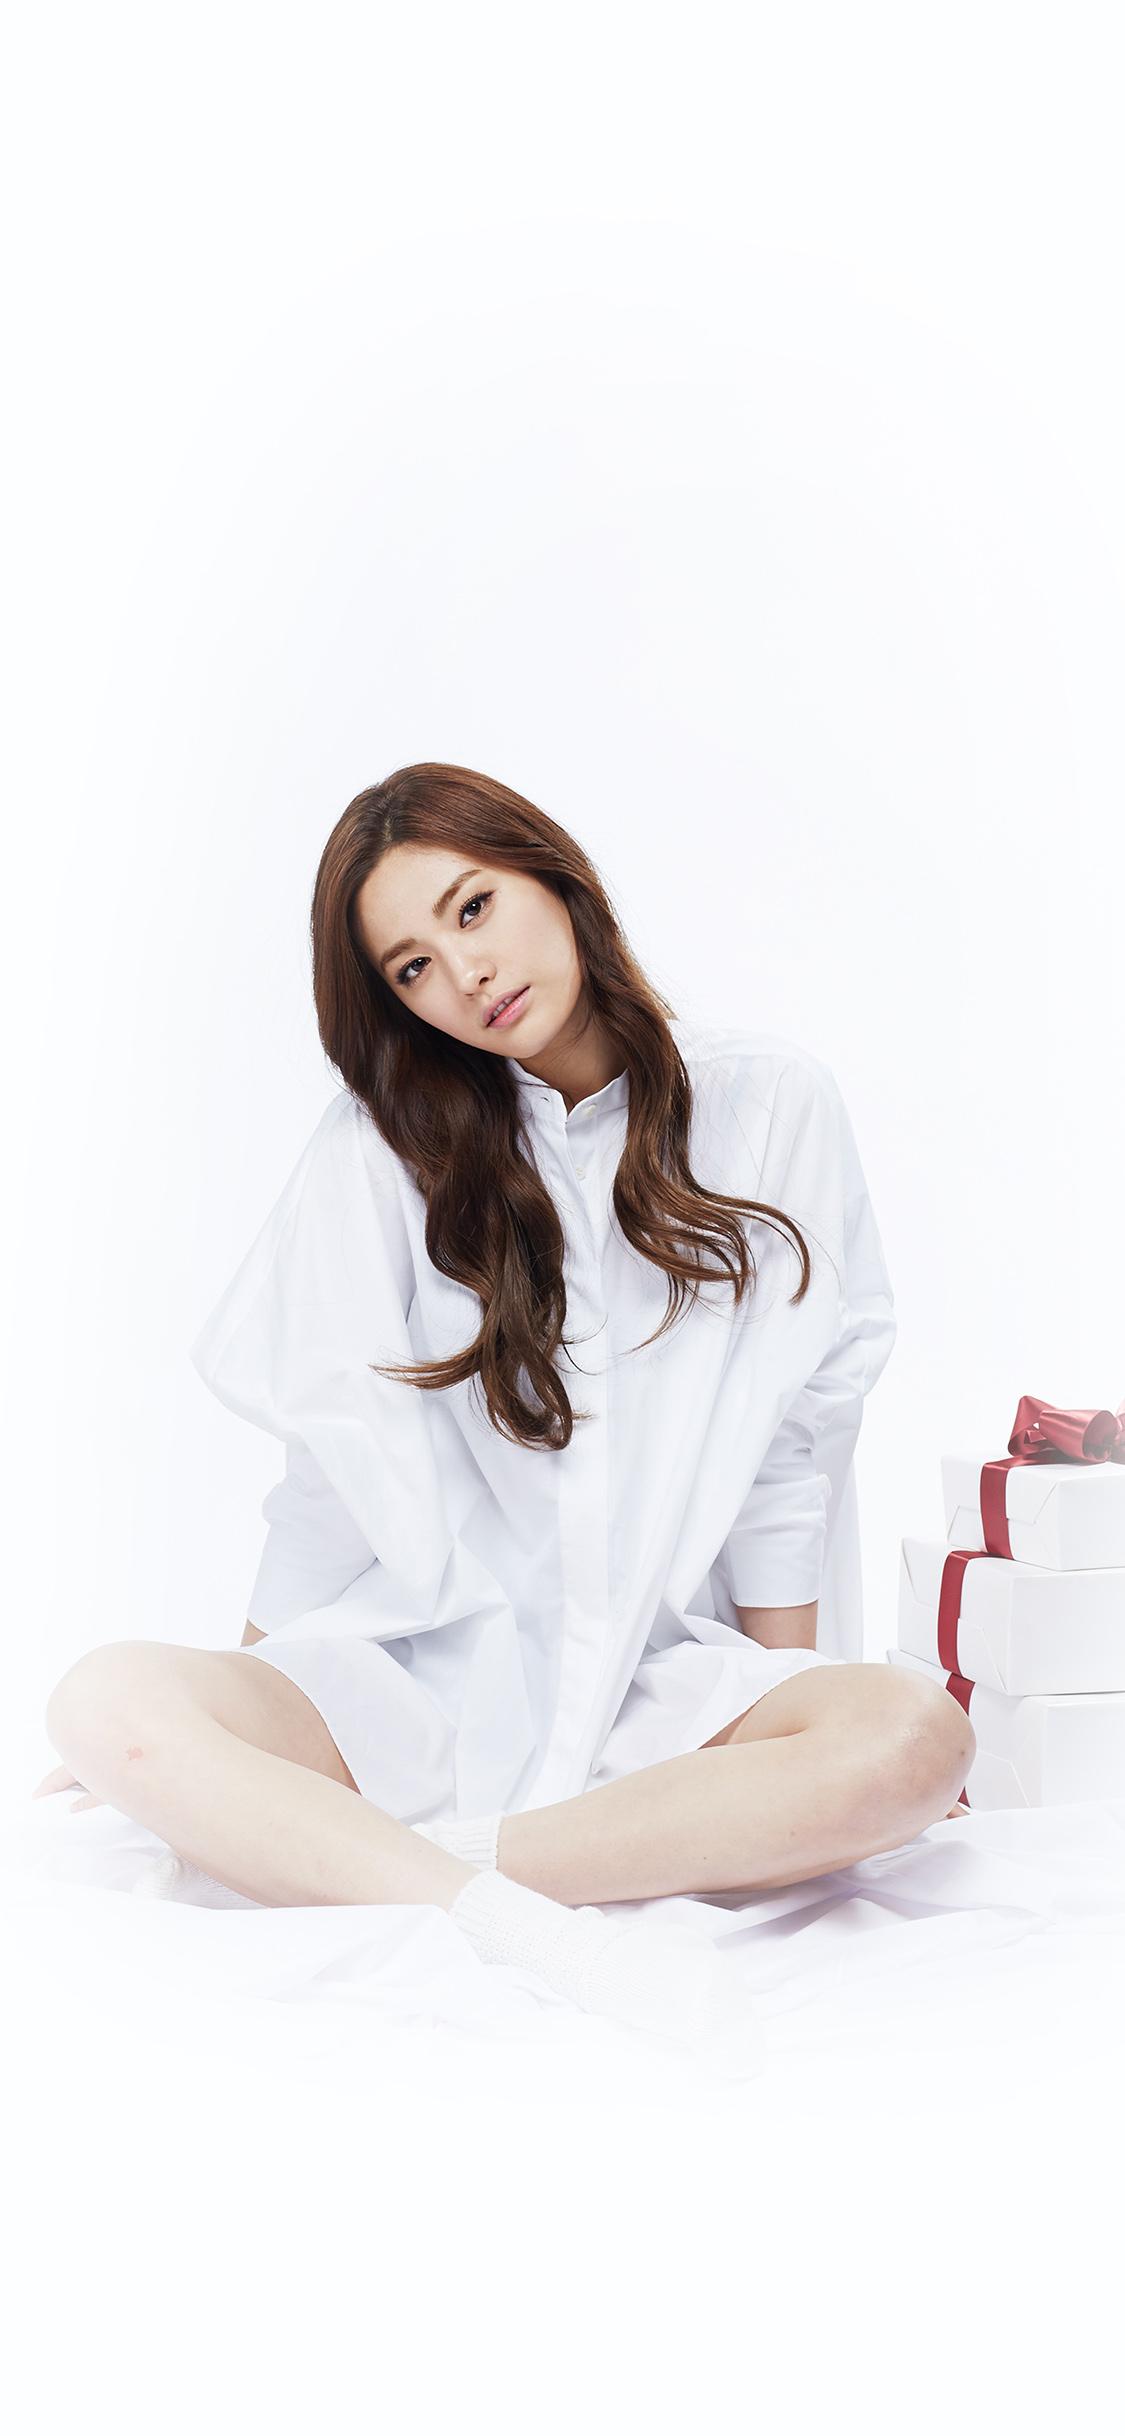 hg51-nana-kpop-model-white-beauty ...